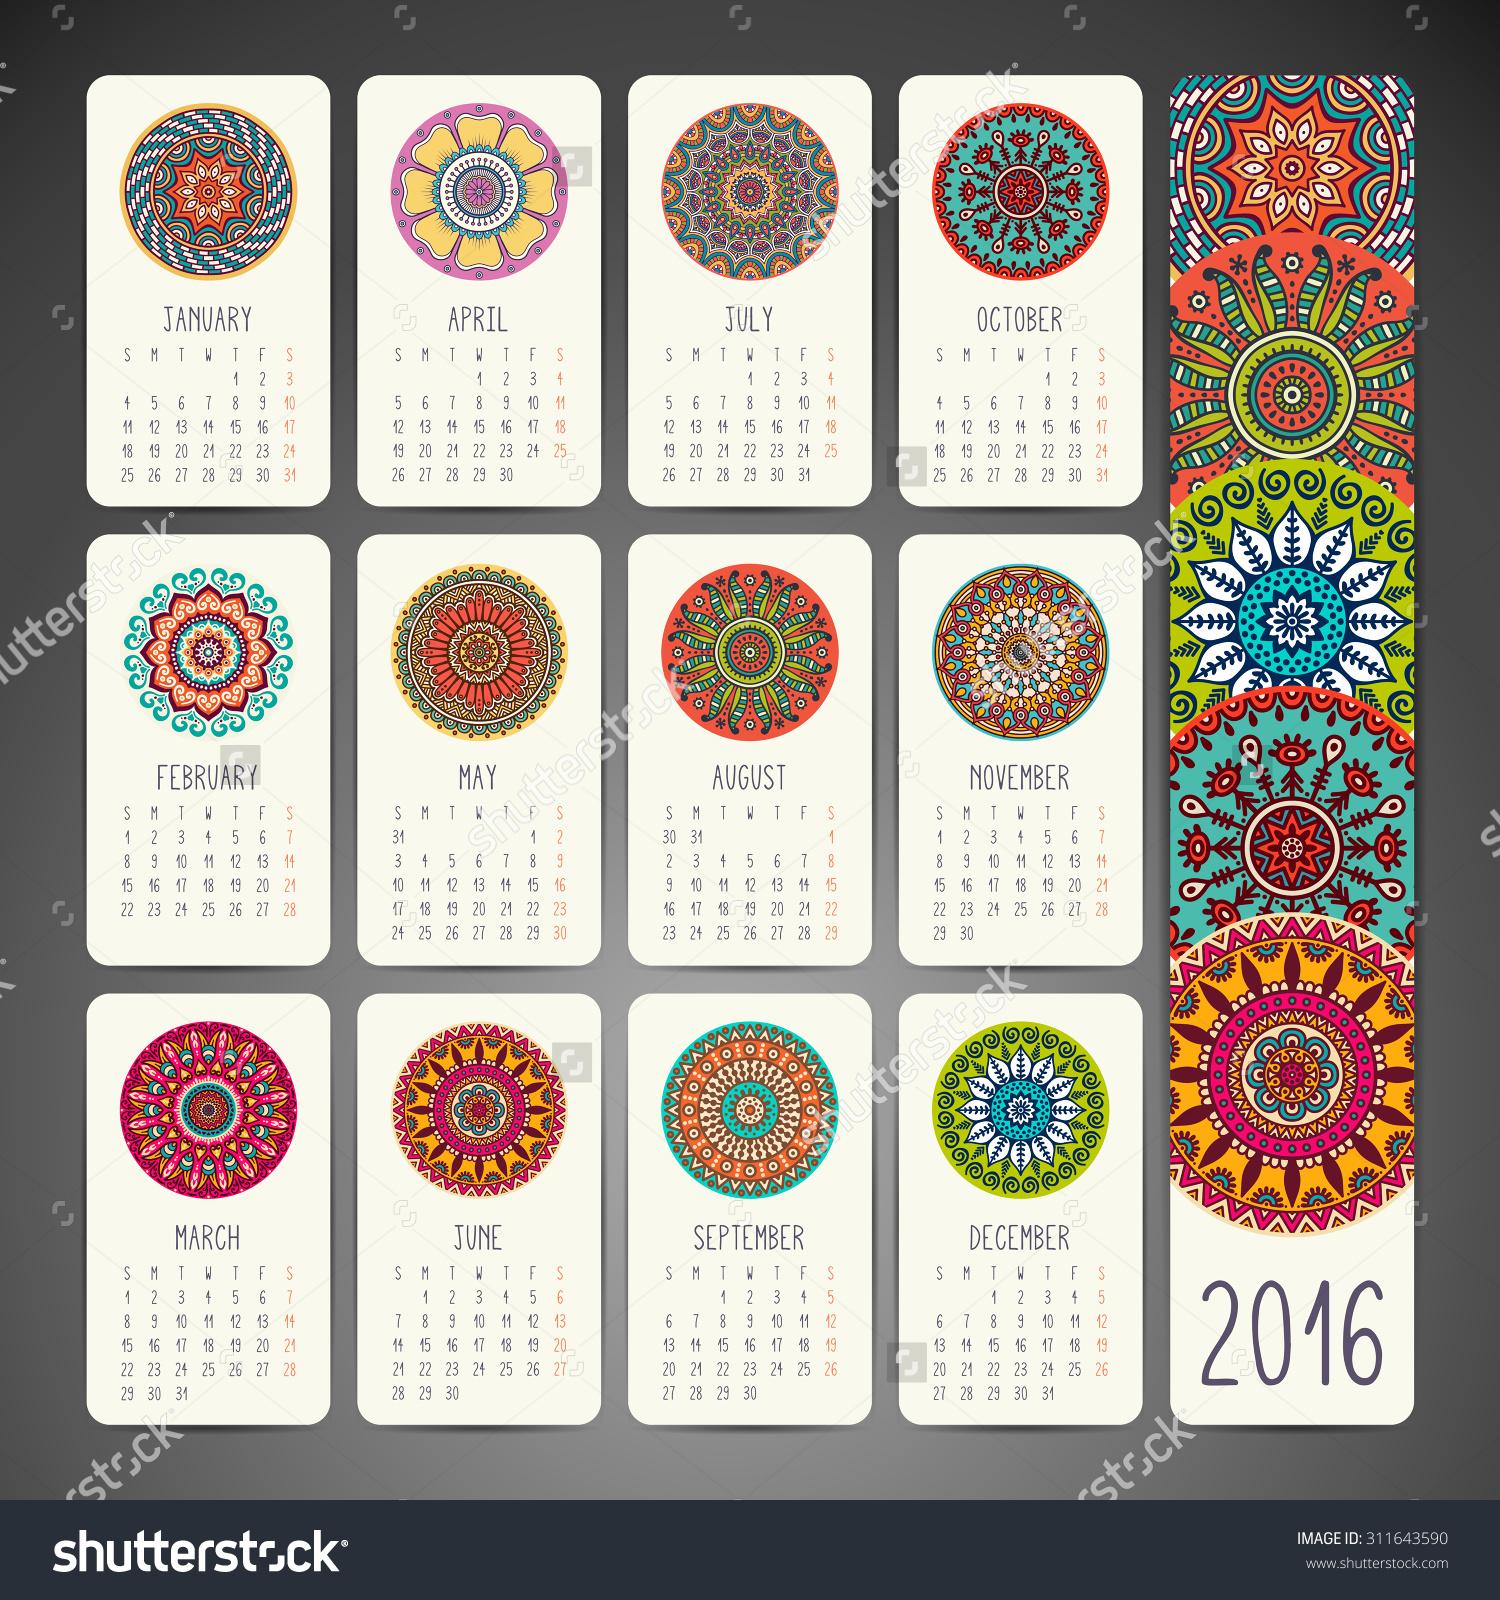 Calendar 2016. Vintage Decorative Elements. Ornamental Floral.